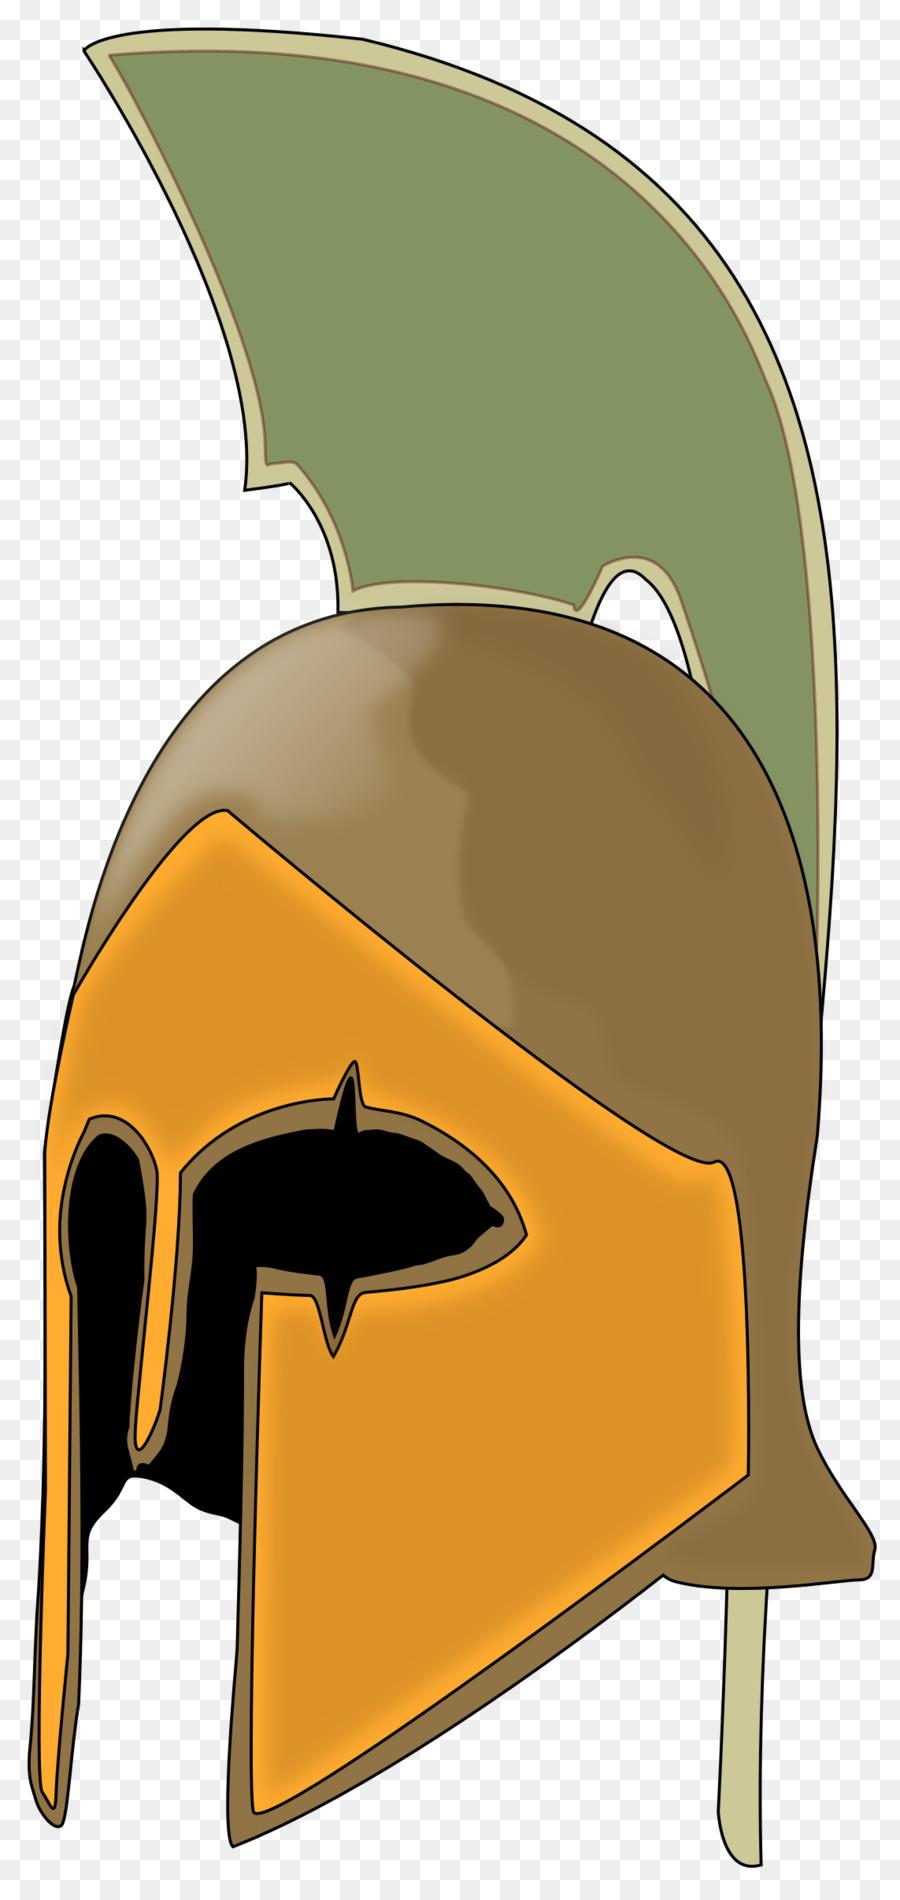 Spartan clipart knight helmet. Cartoon png download free